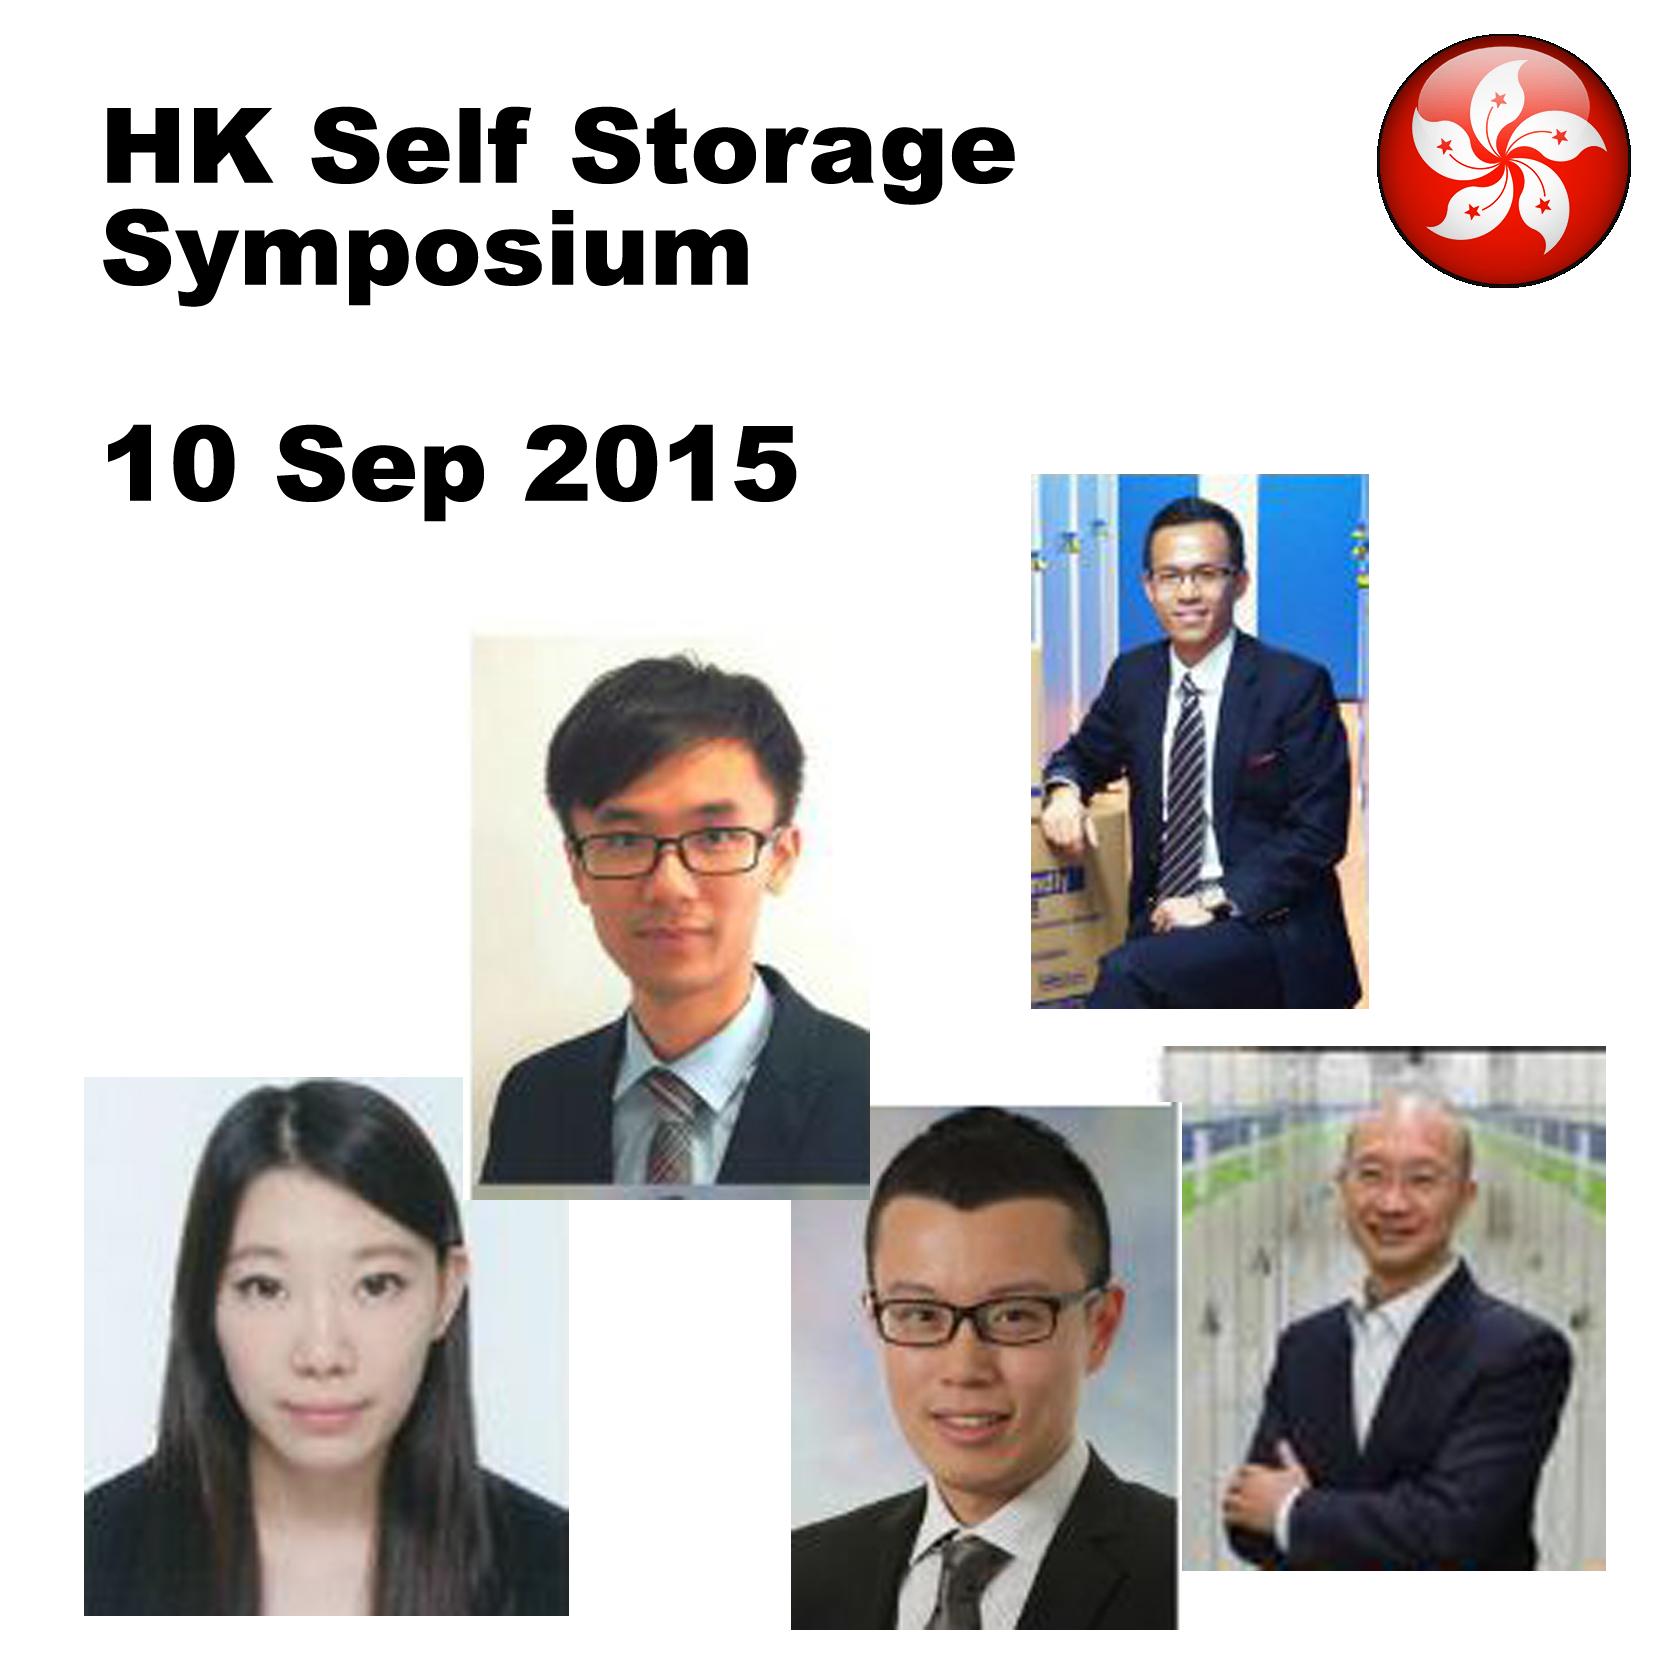 Sep 10 - HK Self Storage Symposium